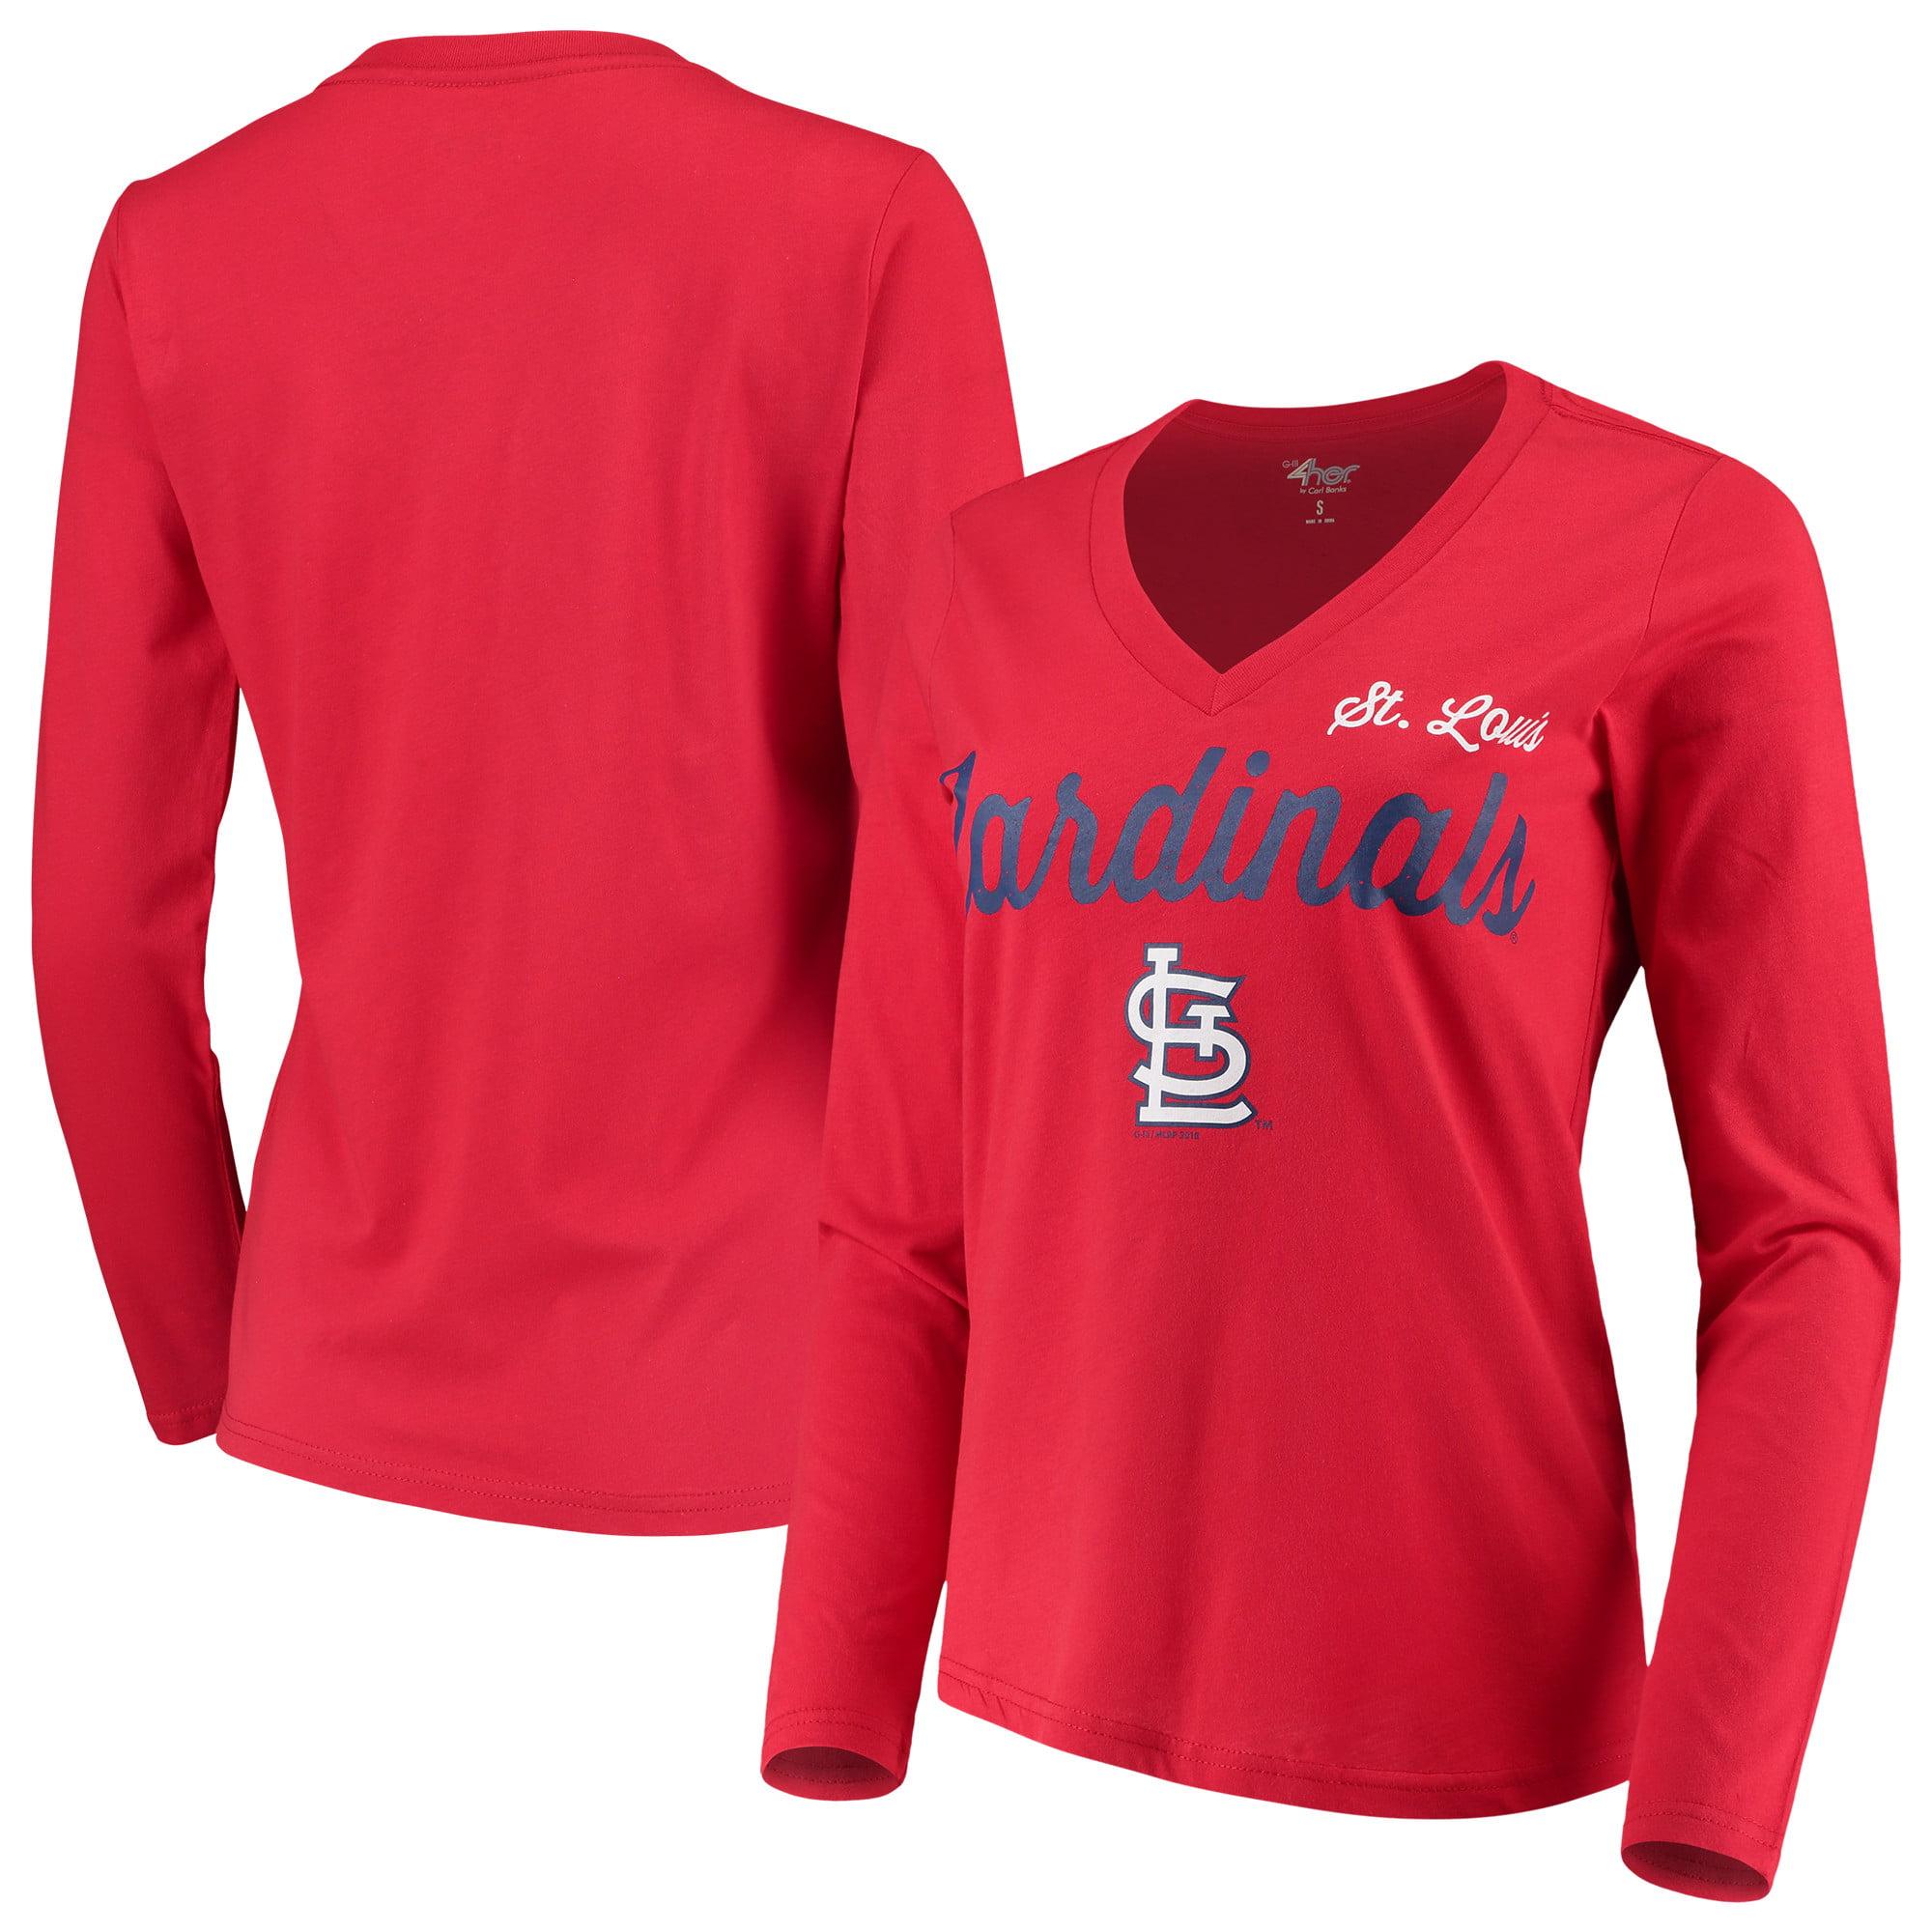 St. Louis Cardinals G-III 4Her by Carl Banks Women's Preseason Long Sleeve V-Neck T-Shirt - Red